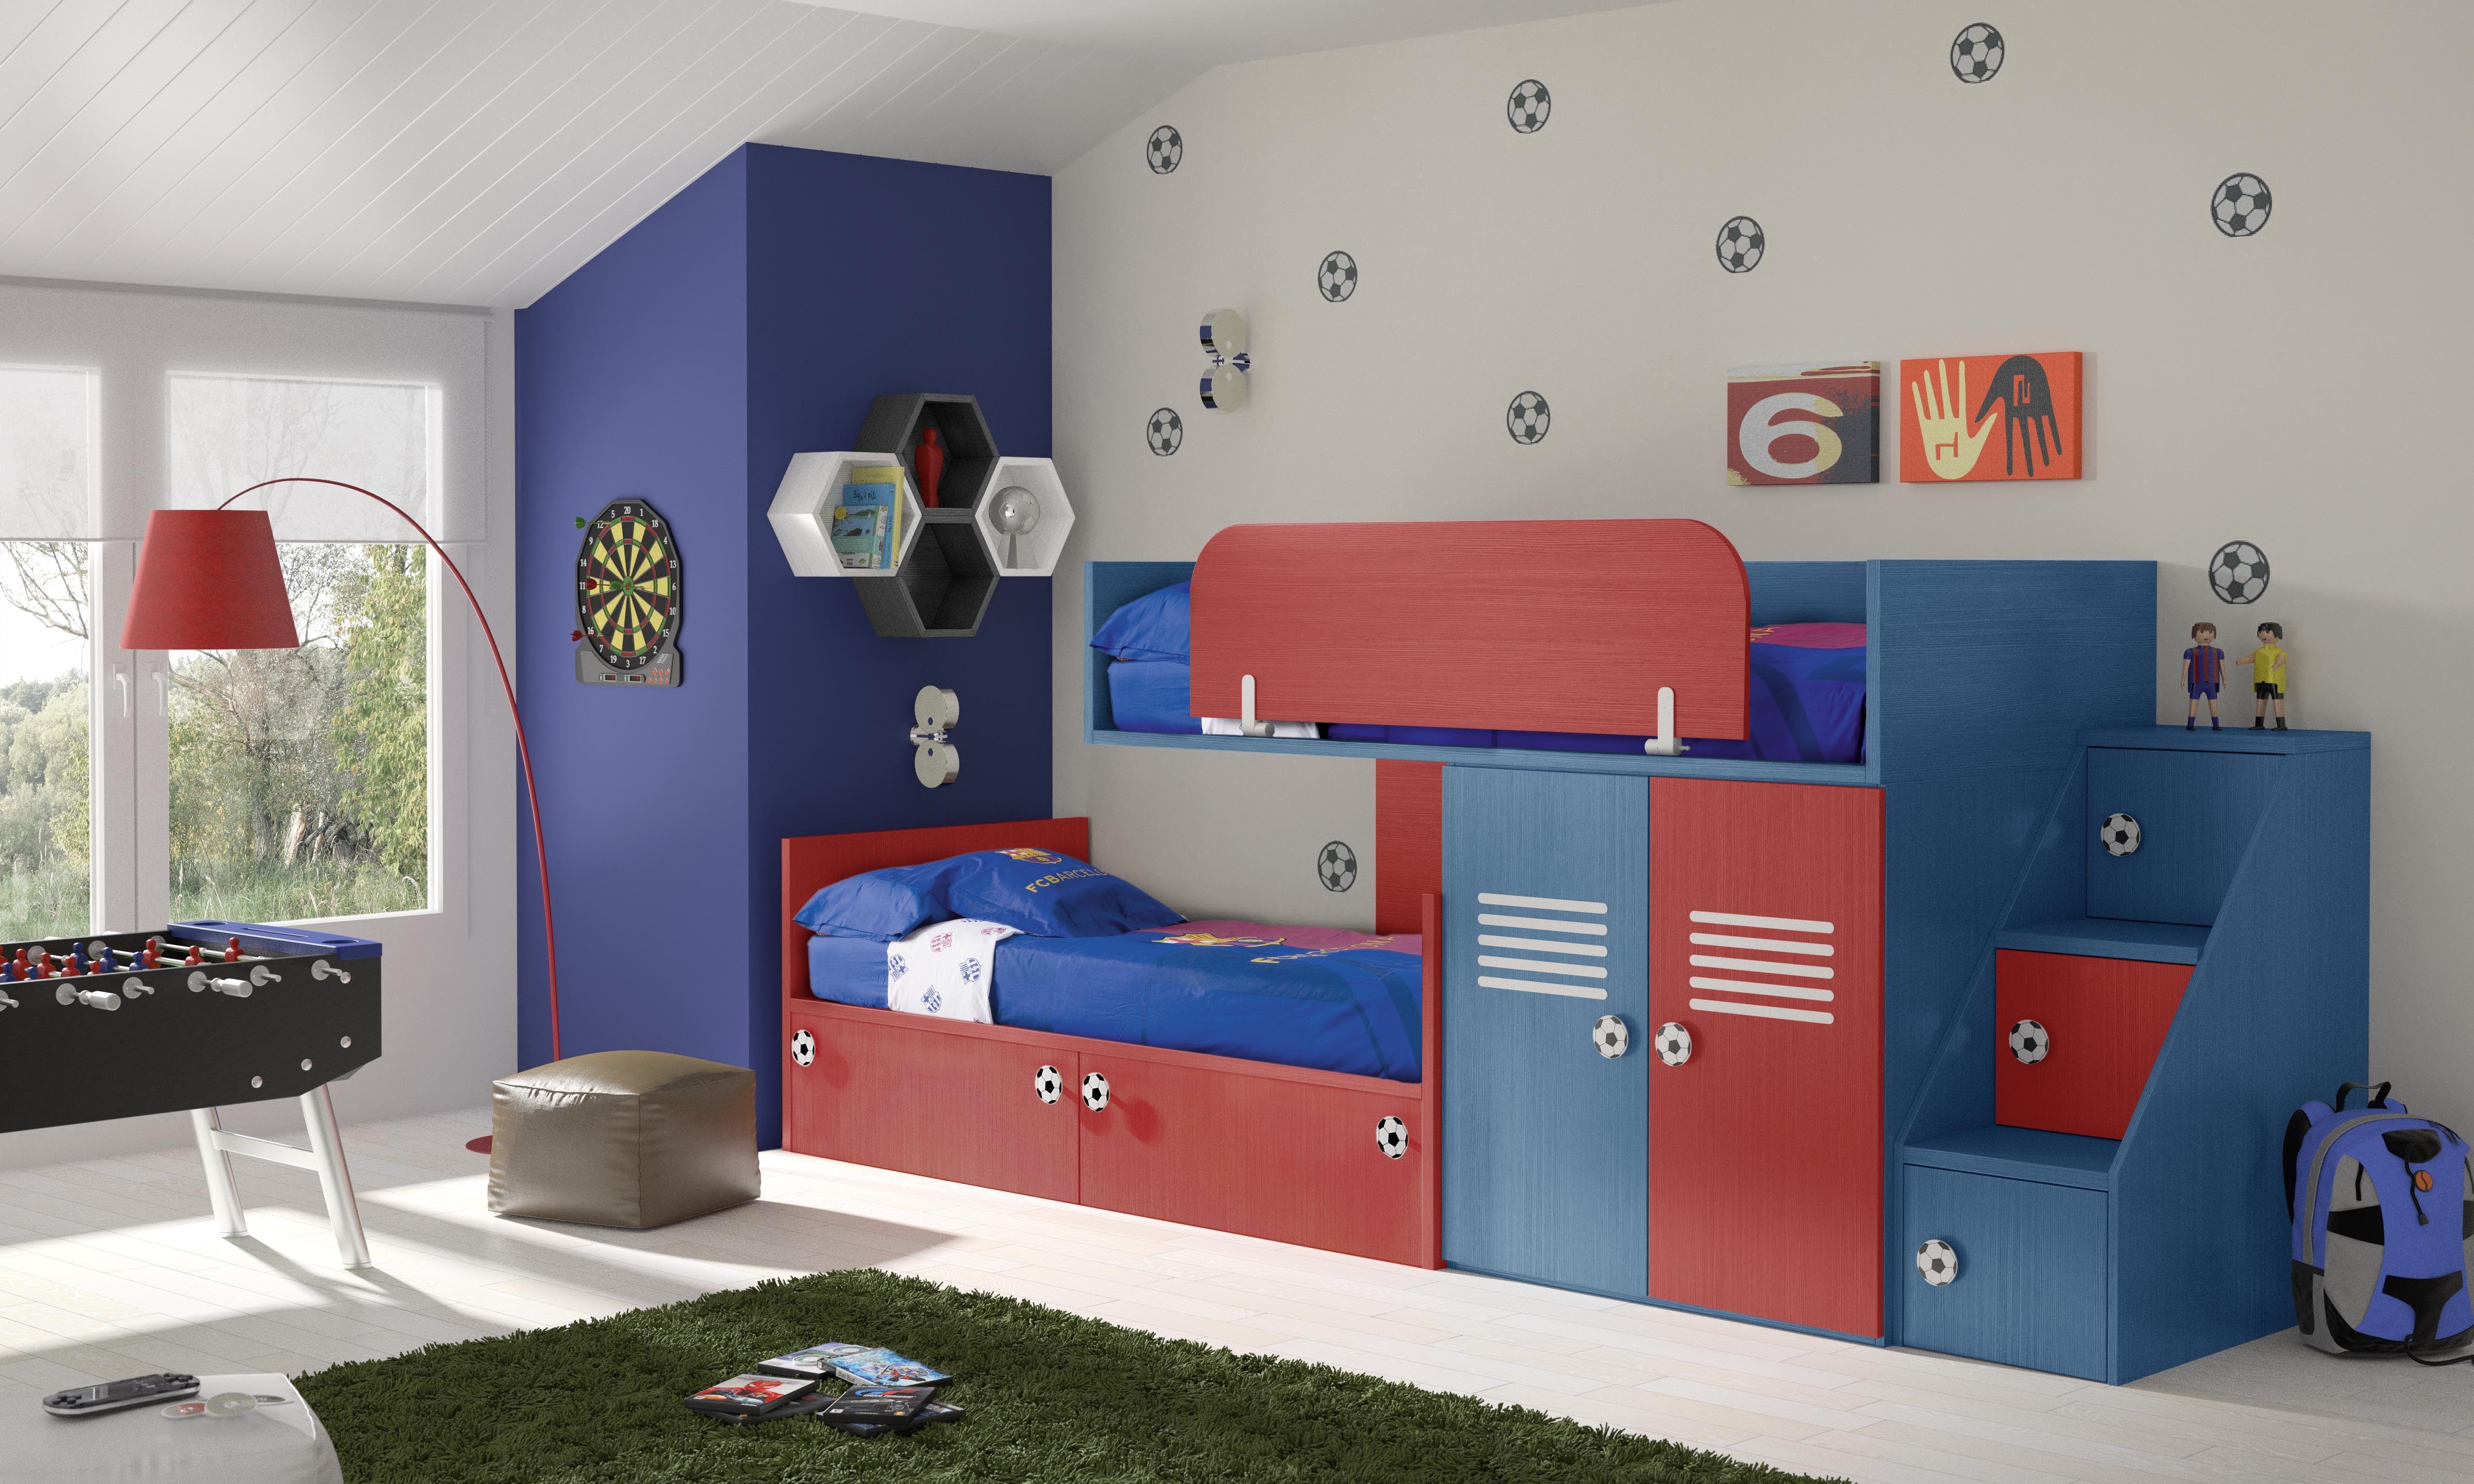 Habitaciones infantiles tem ticas f tbol 1 barcelona f tbol football habitacion chicas - Habitaciones infantiles tematicas ...